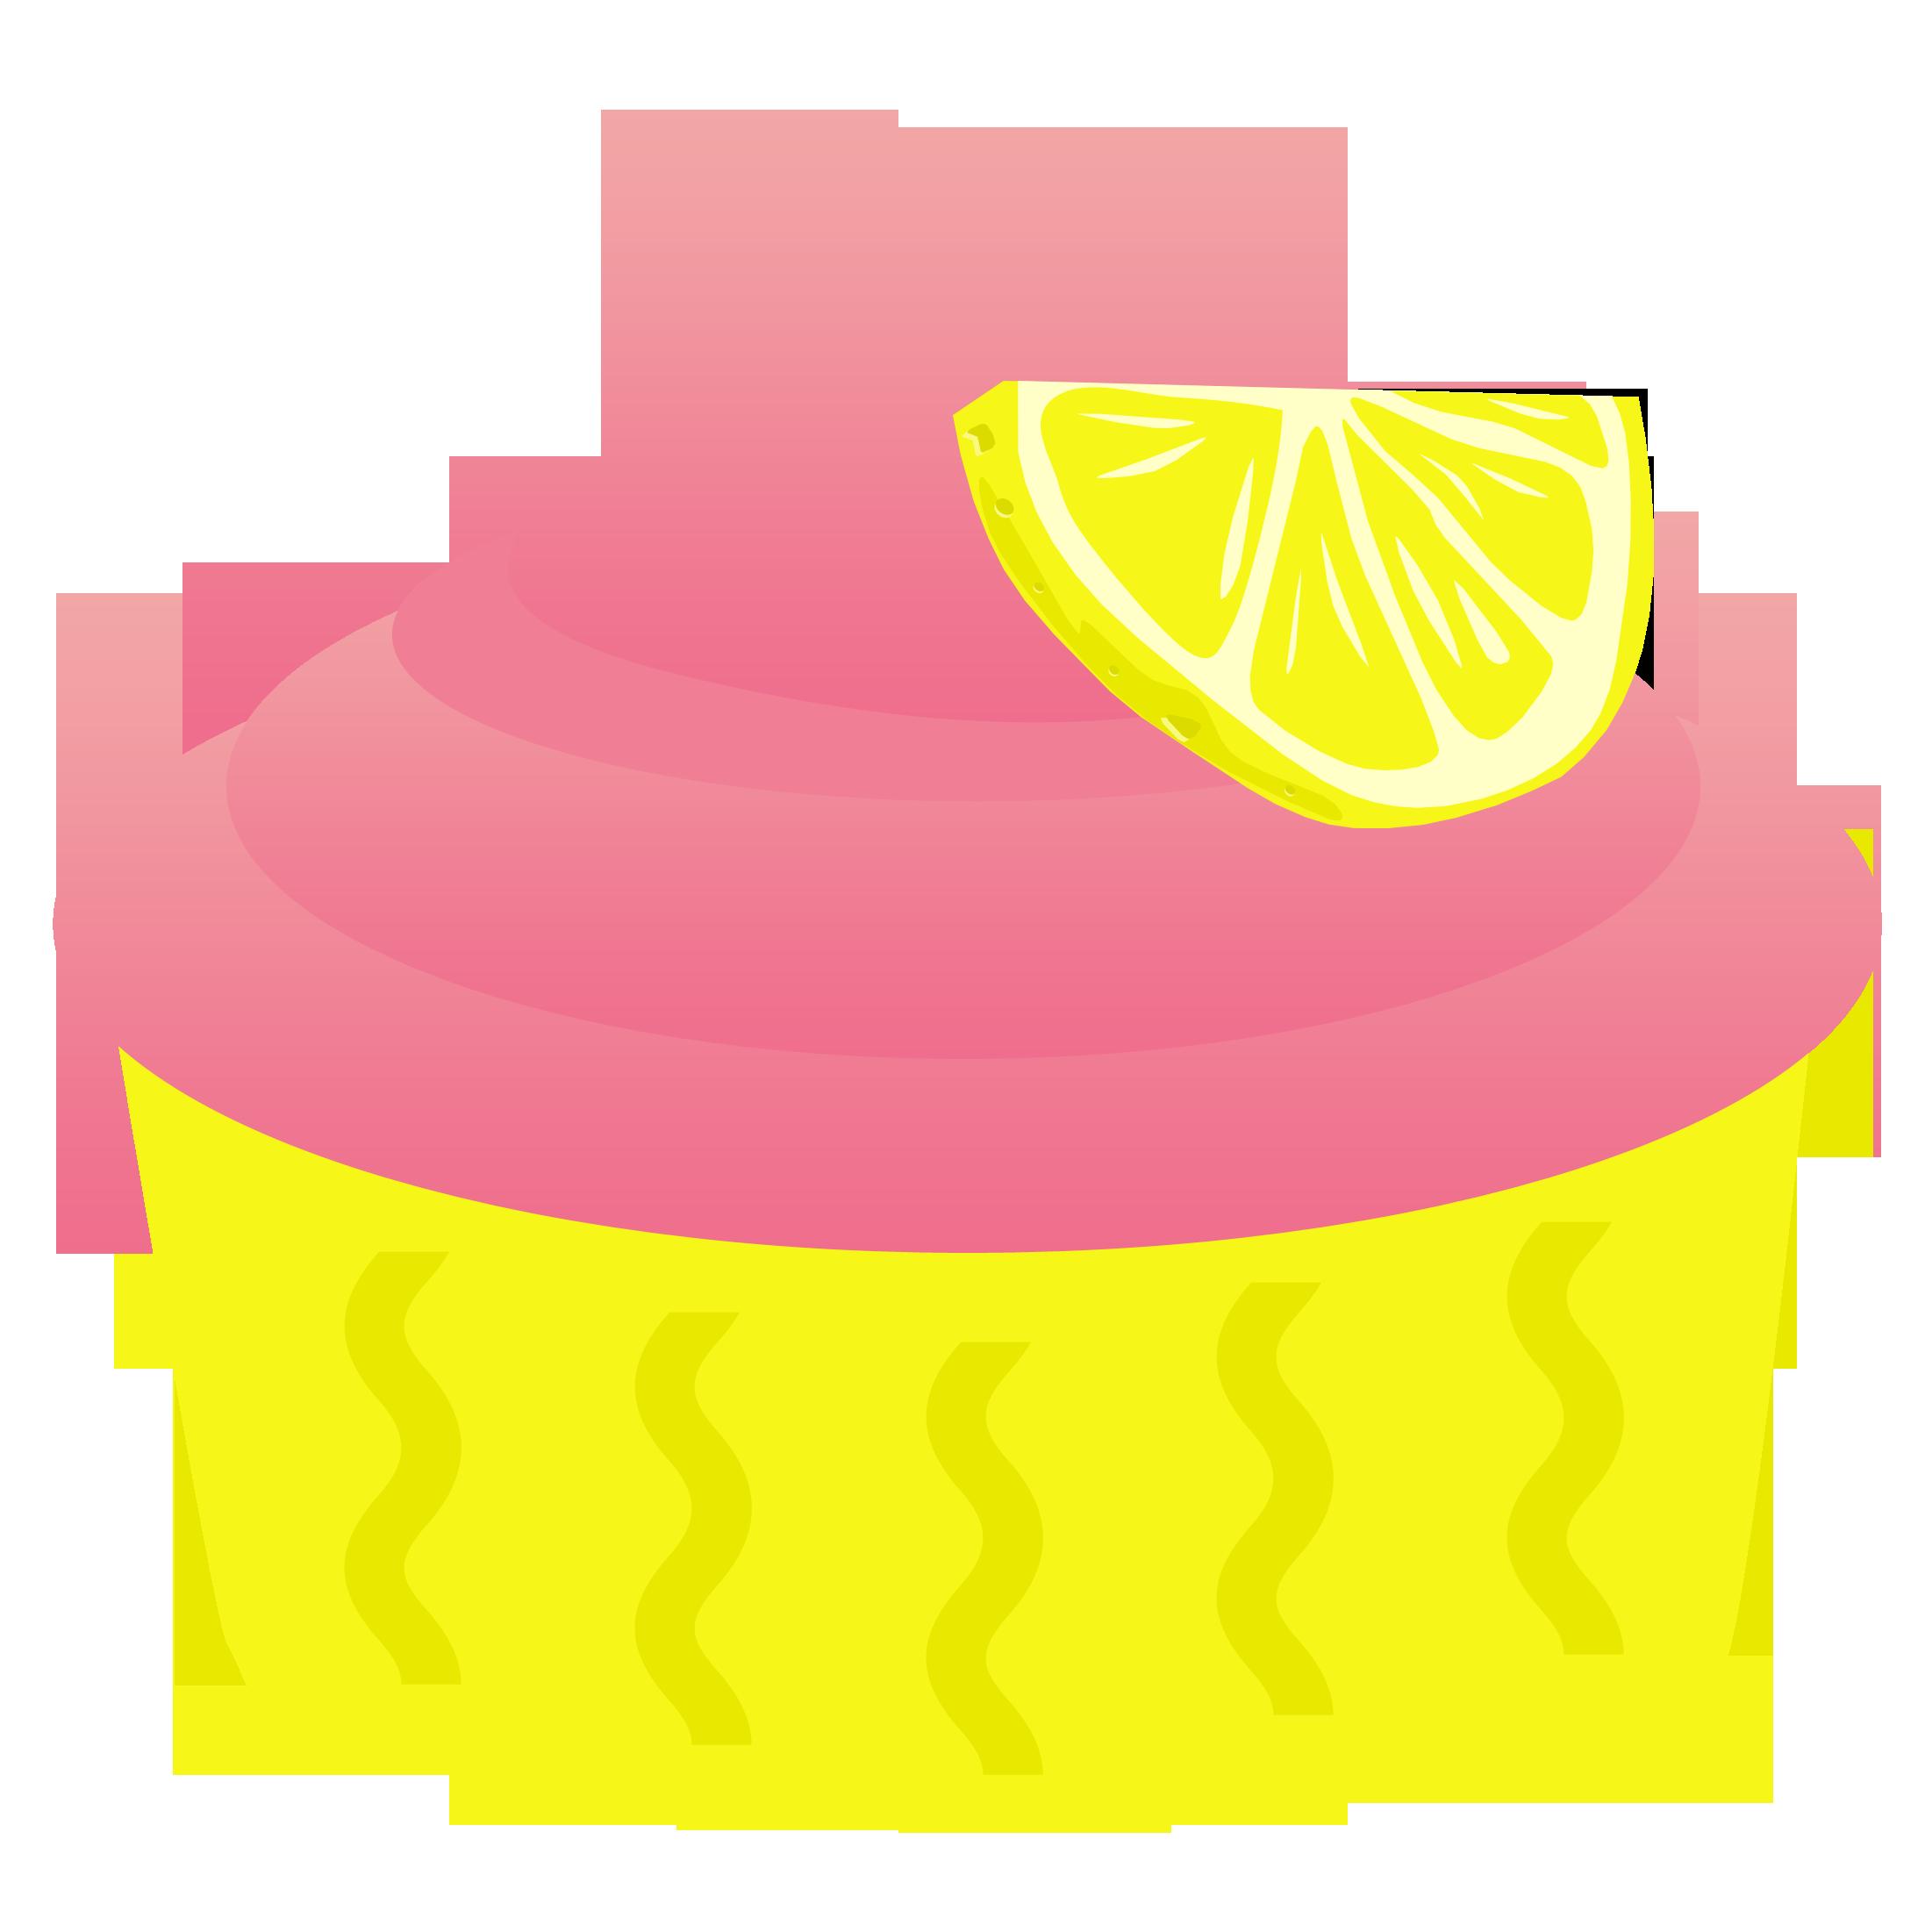 2202x2202 Cupcake Clip Art Free Download Images